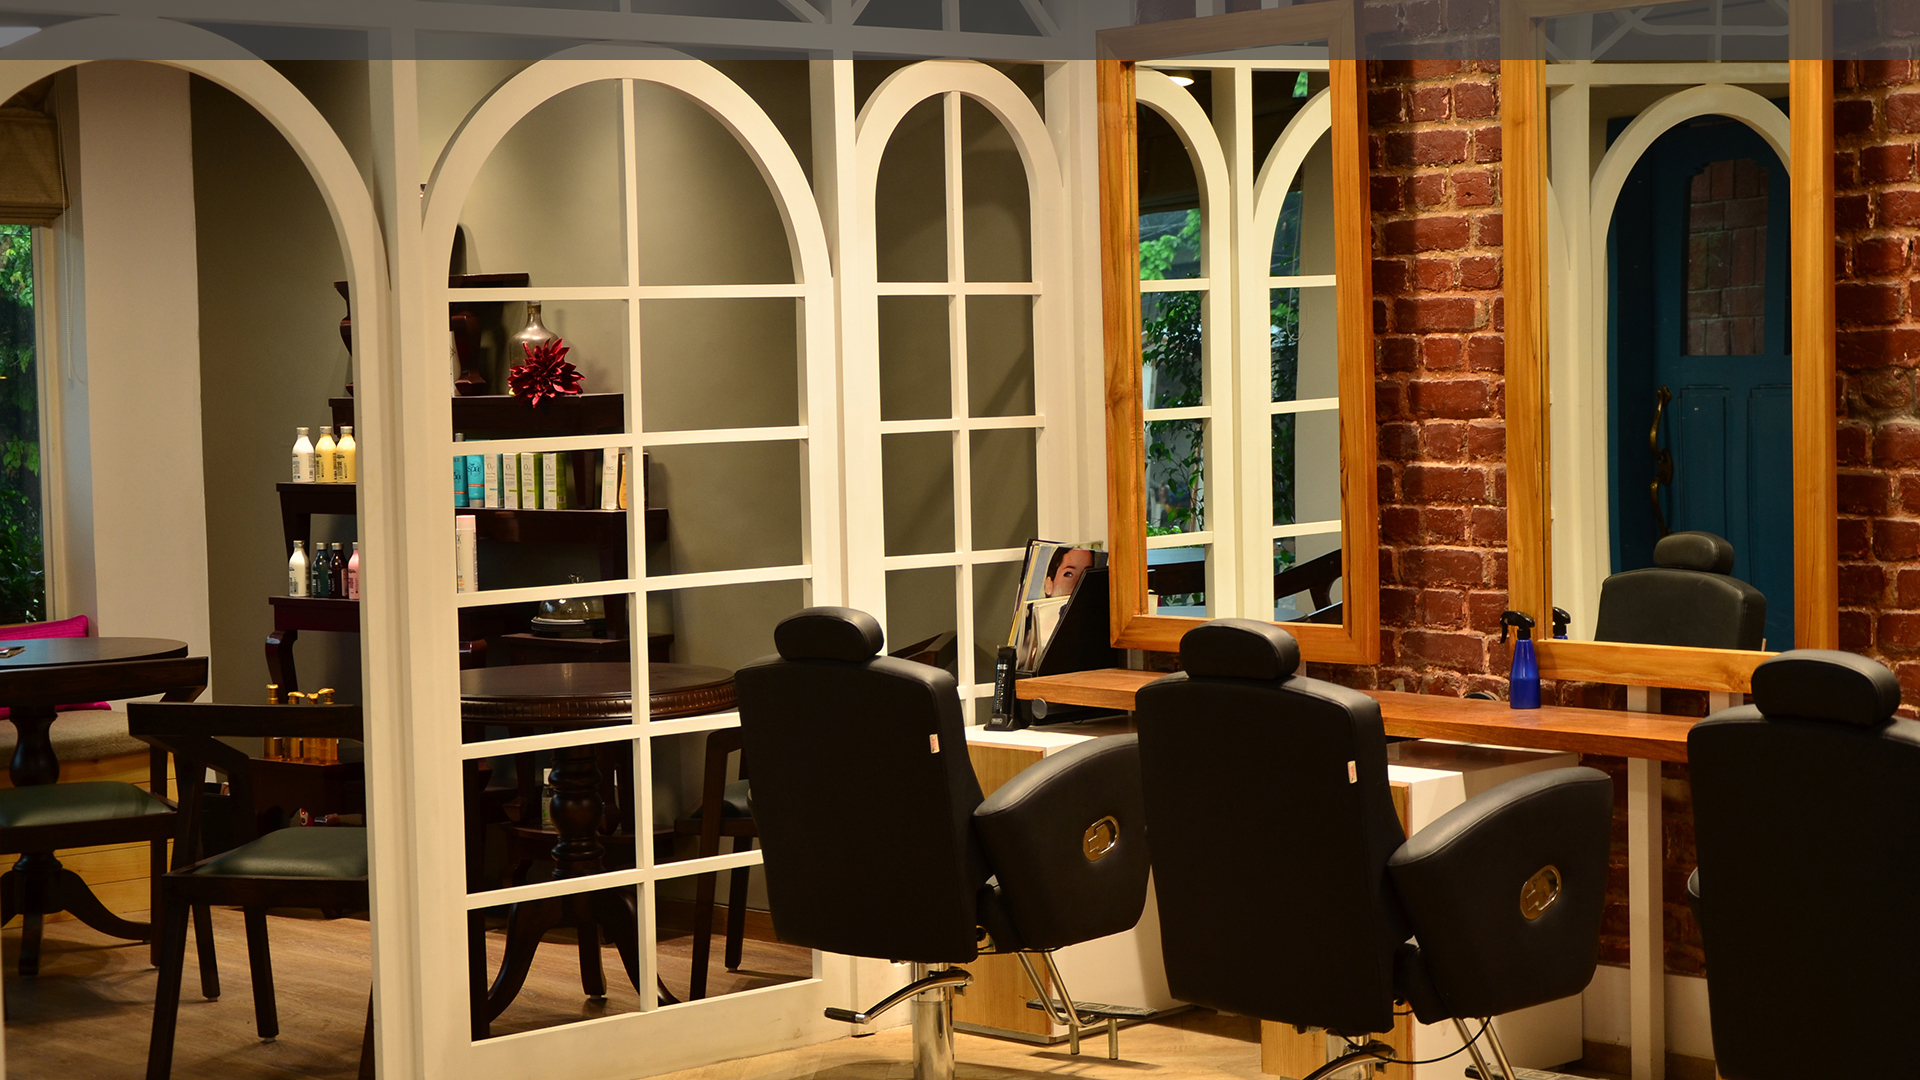 Aalenes-Cafe-salon-Gurgaon-3